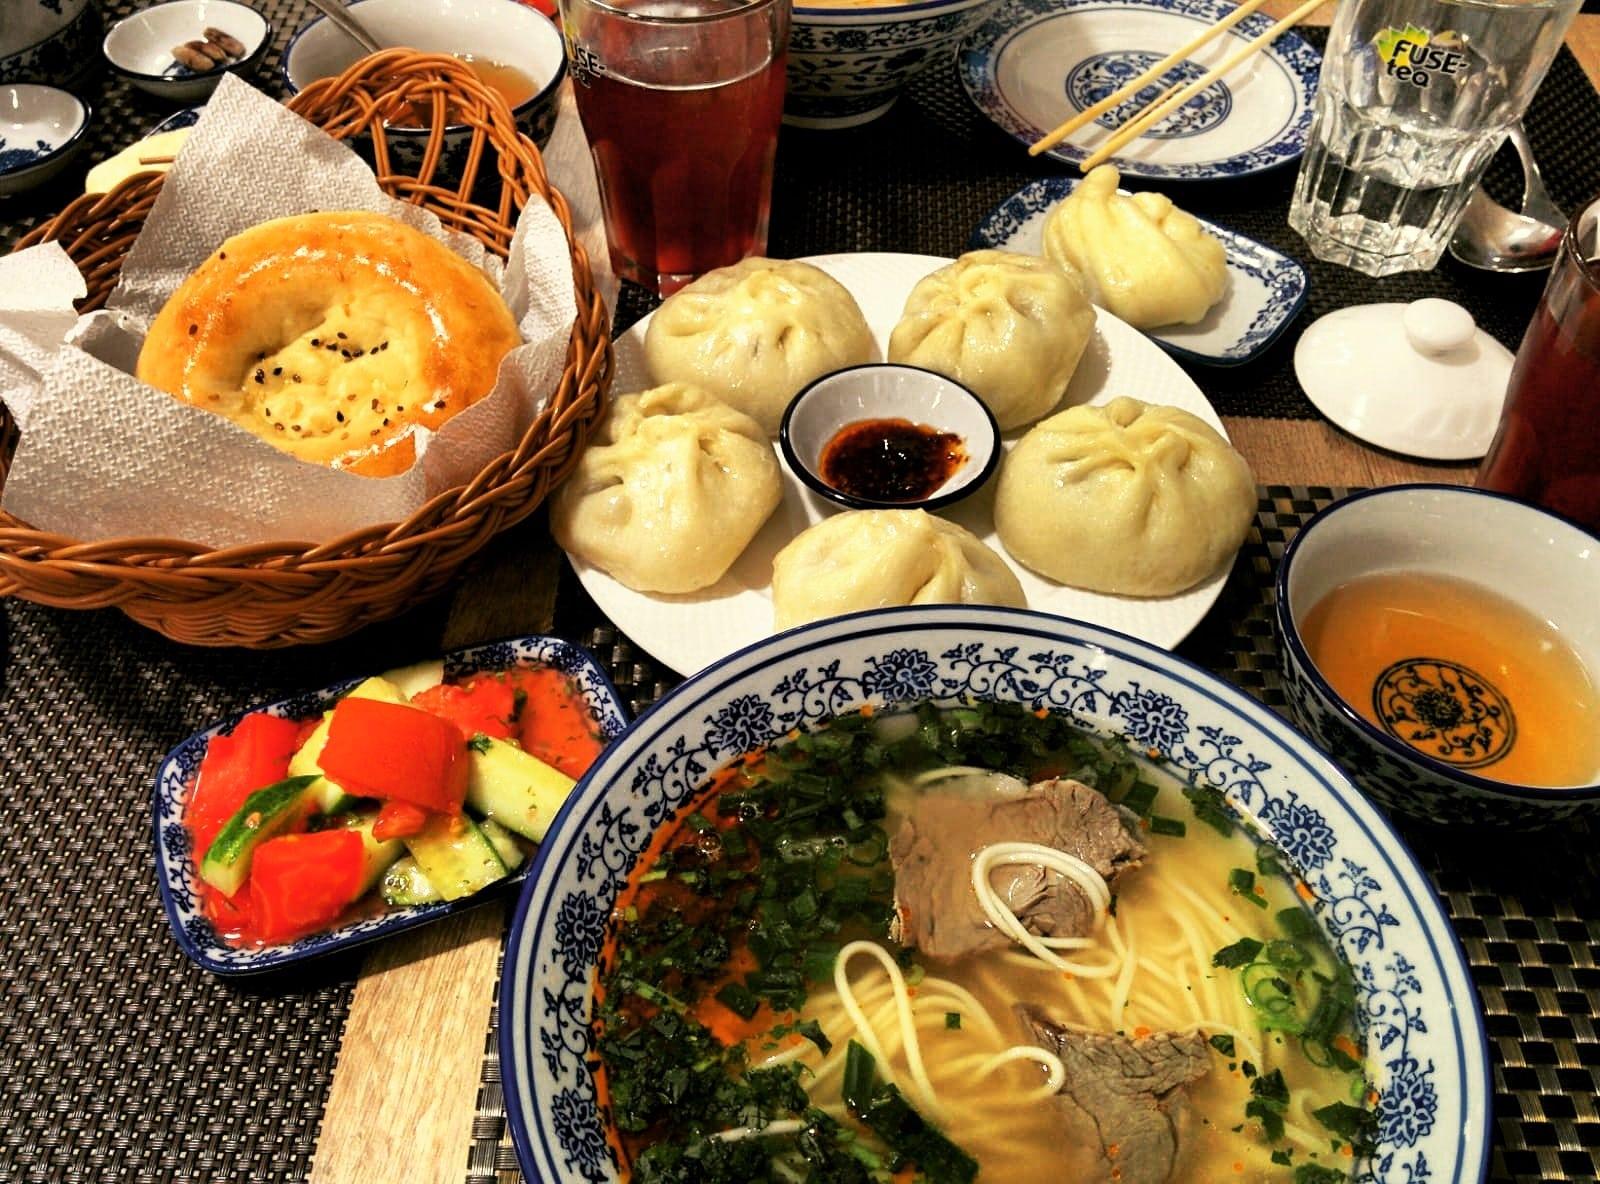 Info Shymkent - Kazakh Cuisine and Kazakhstan's meals